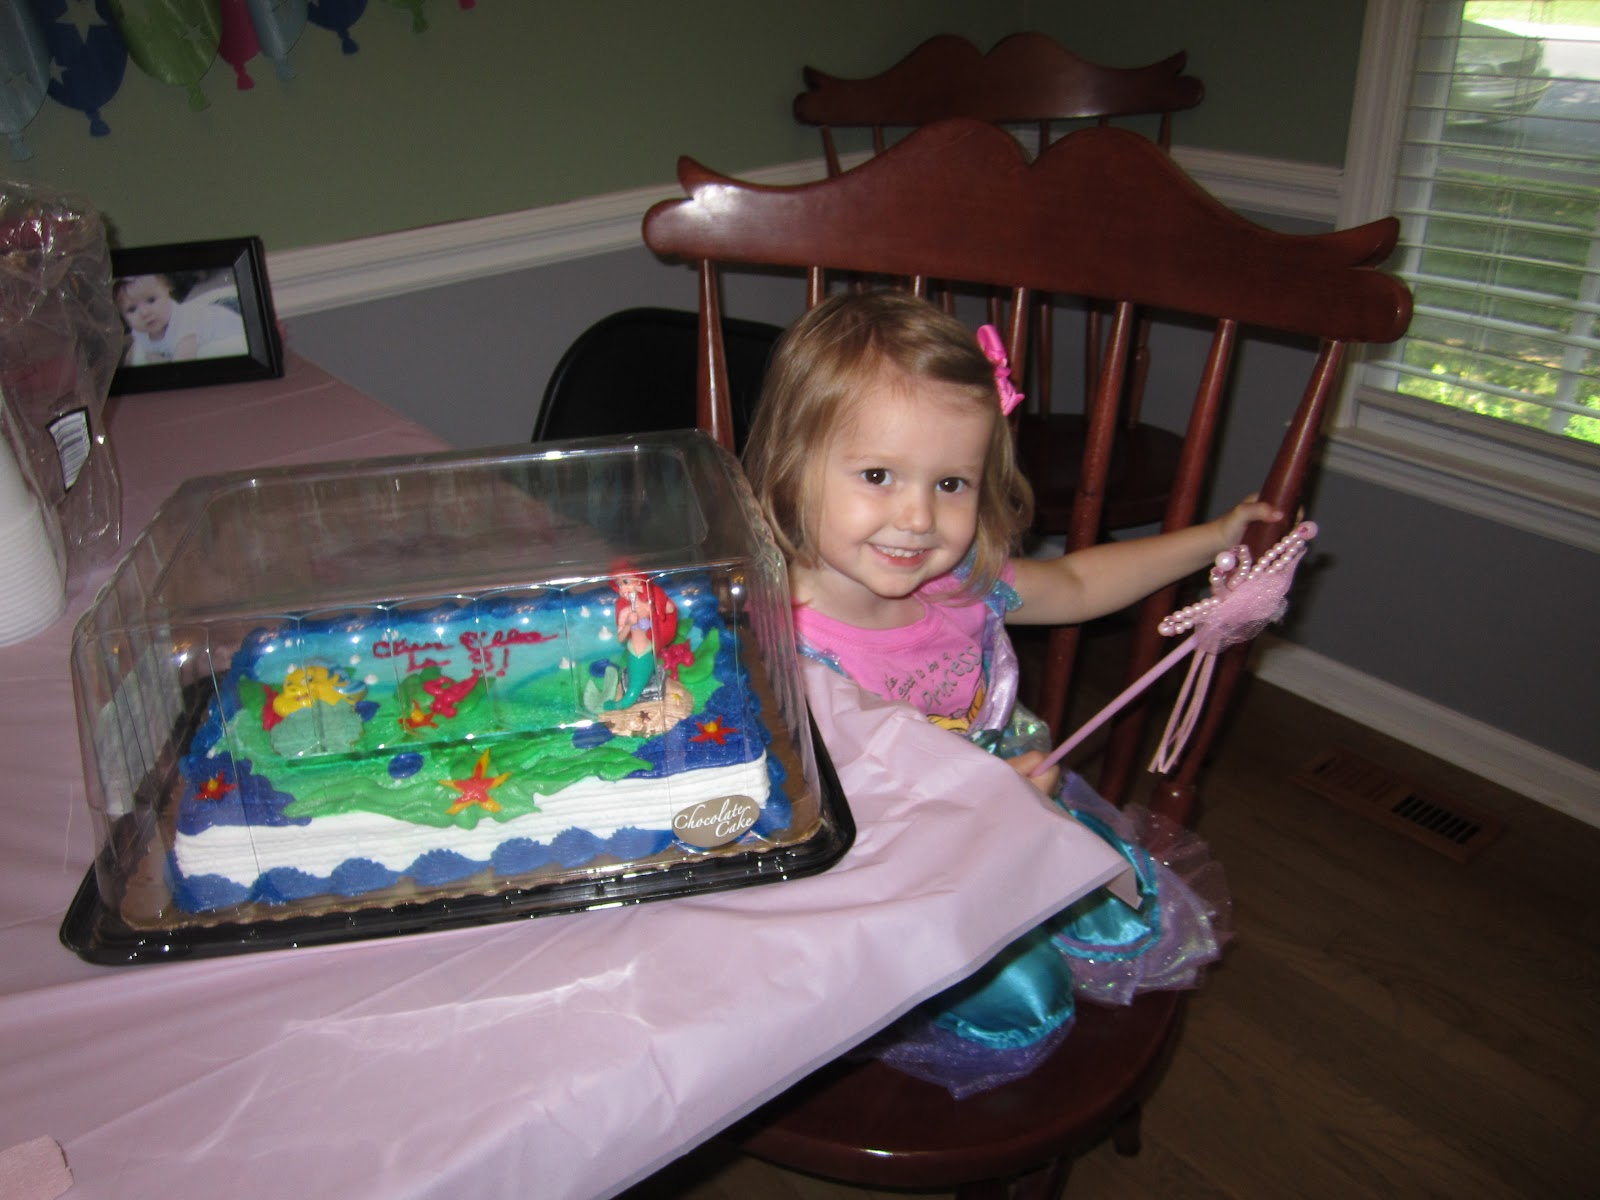 Legos And Baby Dolls Es Three Year Old Princess Party E S Spongebob Birthday Cakes Kroger